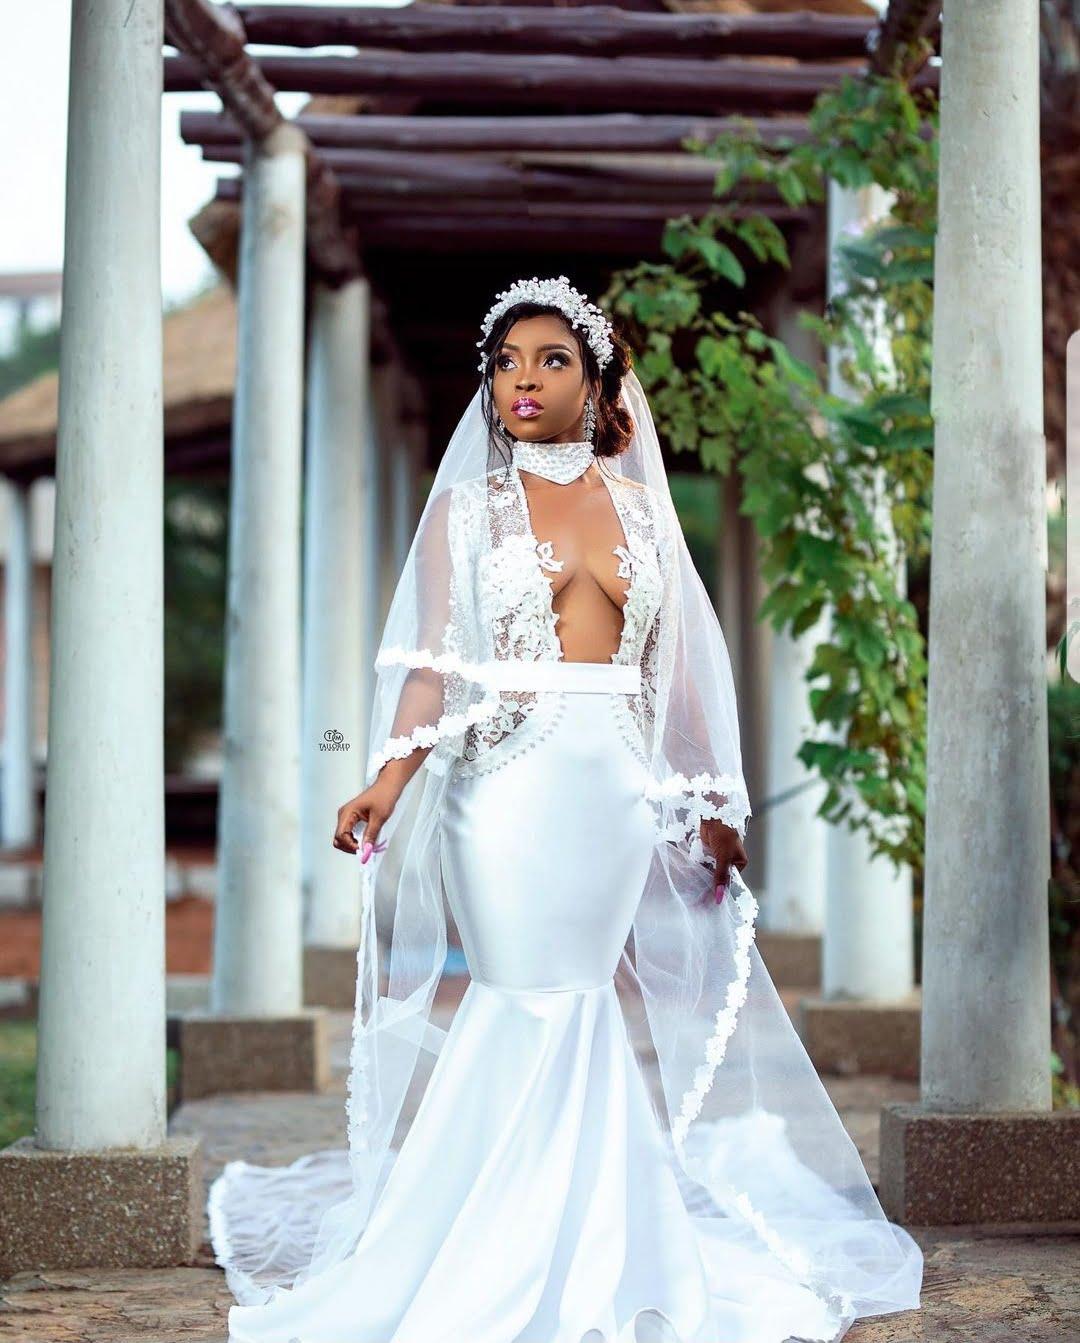 Social media goes Crazy over the wedding gown of a bride (photos) 2